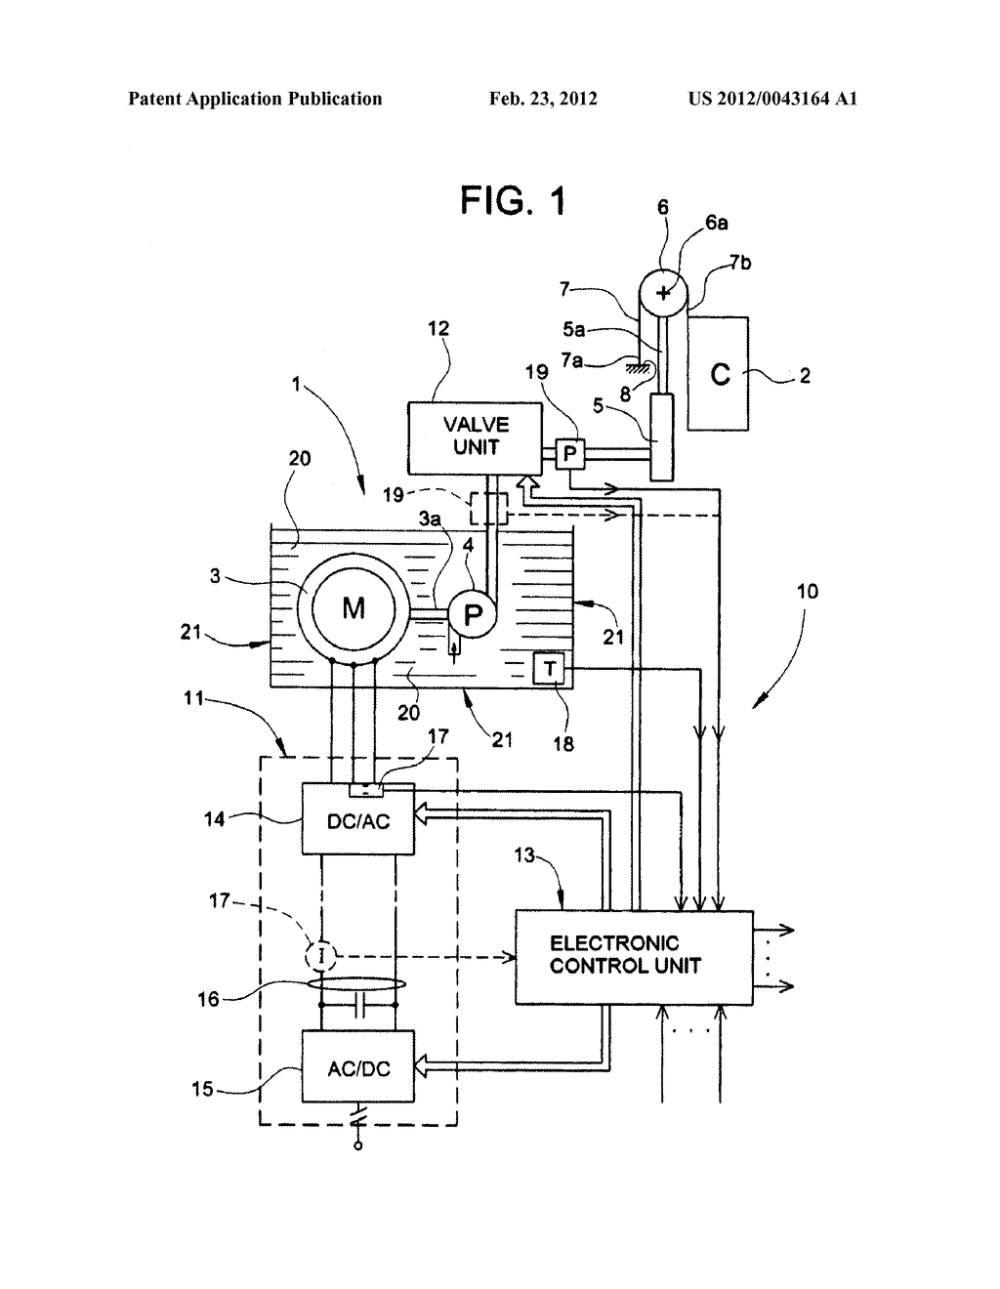 medium resolution of hydraulic elevator schematic control diagram wiring diagram user control system for a hydraulic elevator apparatus diagram